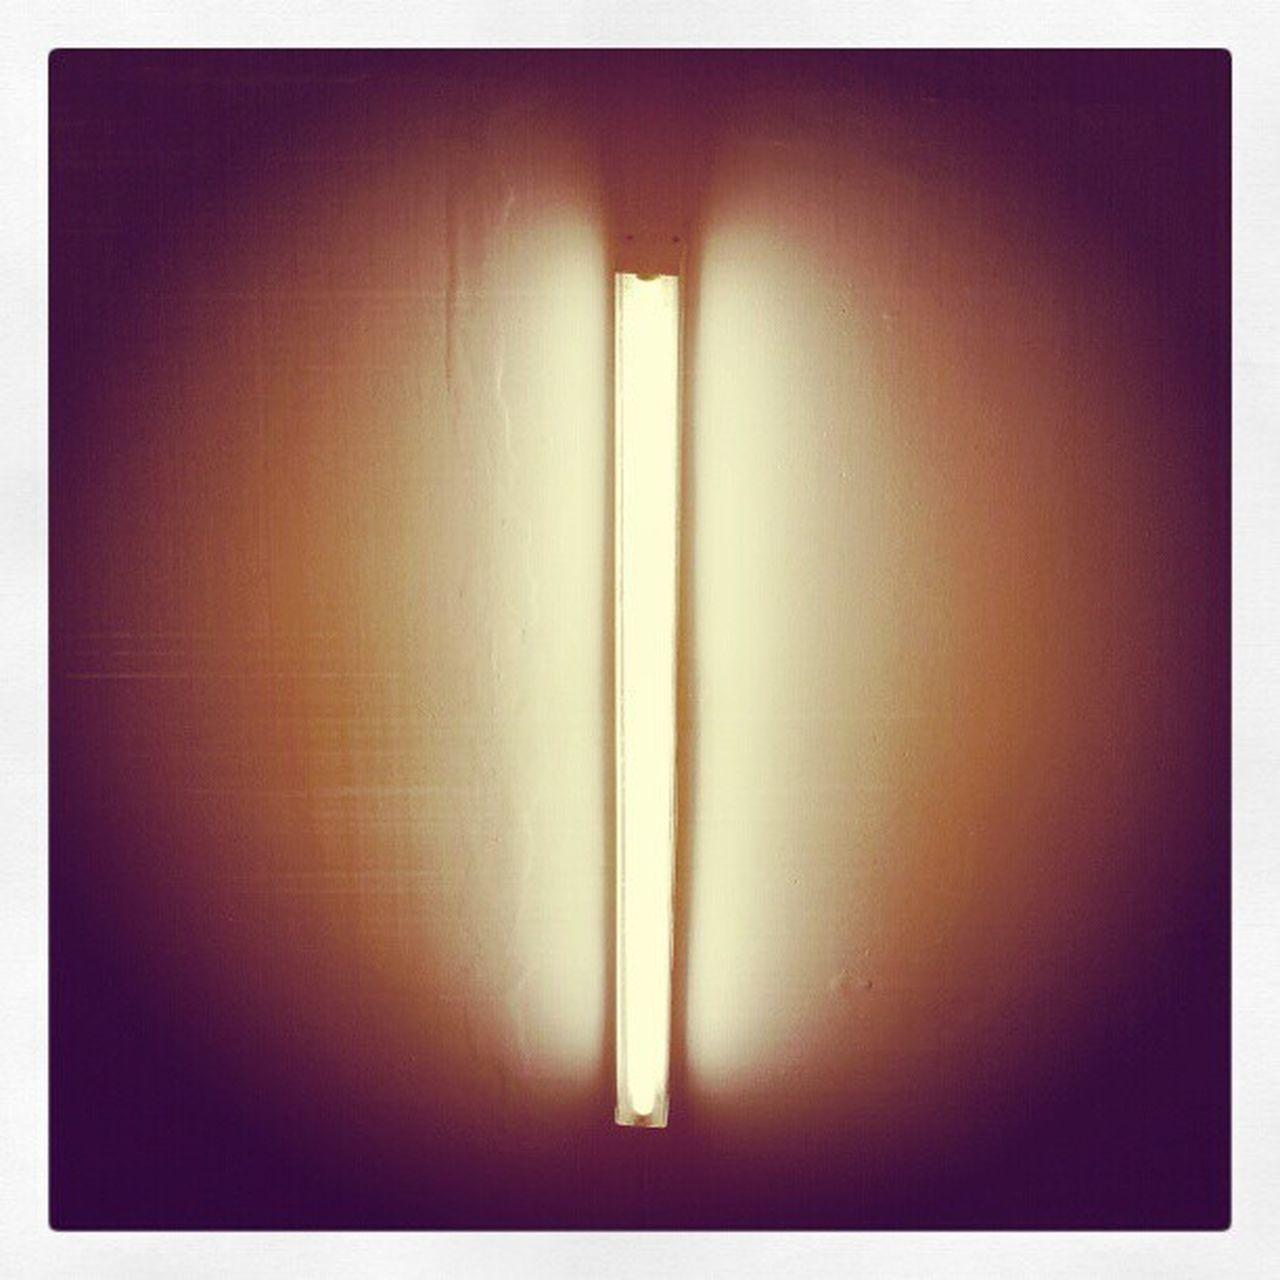 indoors, no people, illuminated, close-up, day